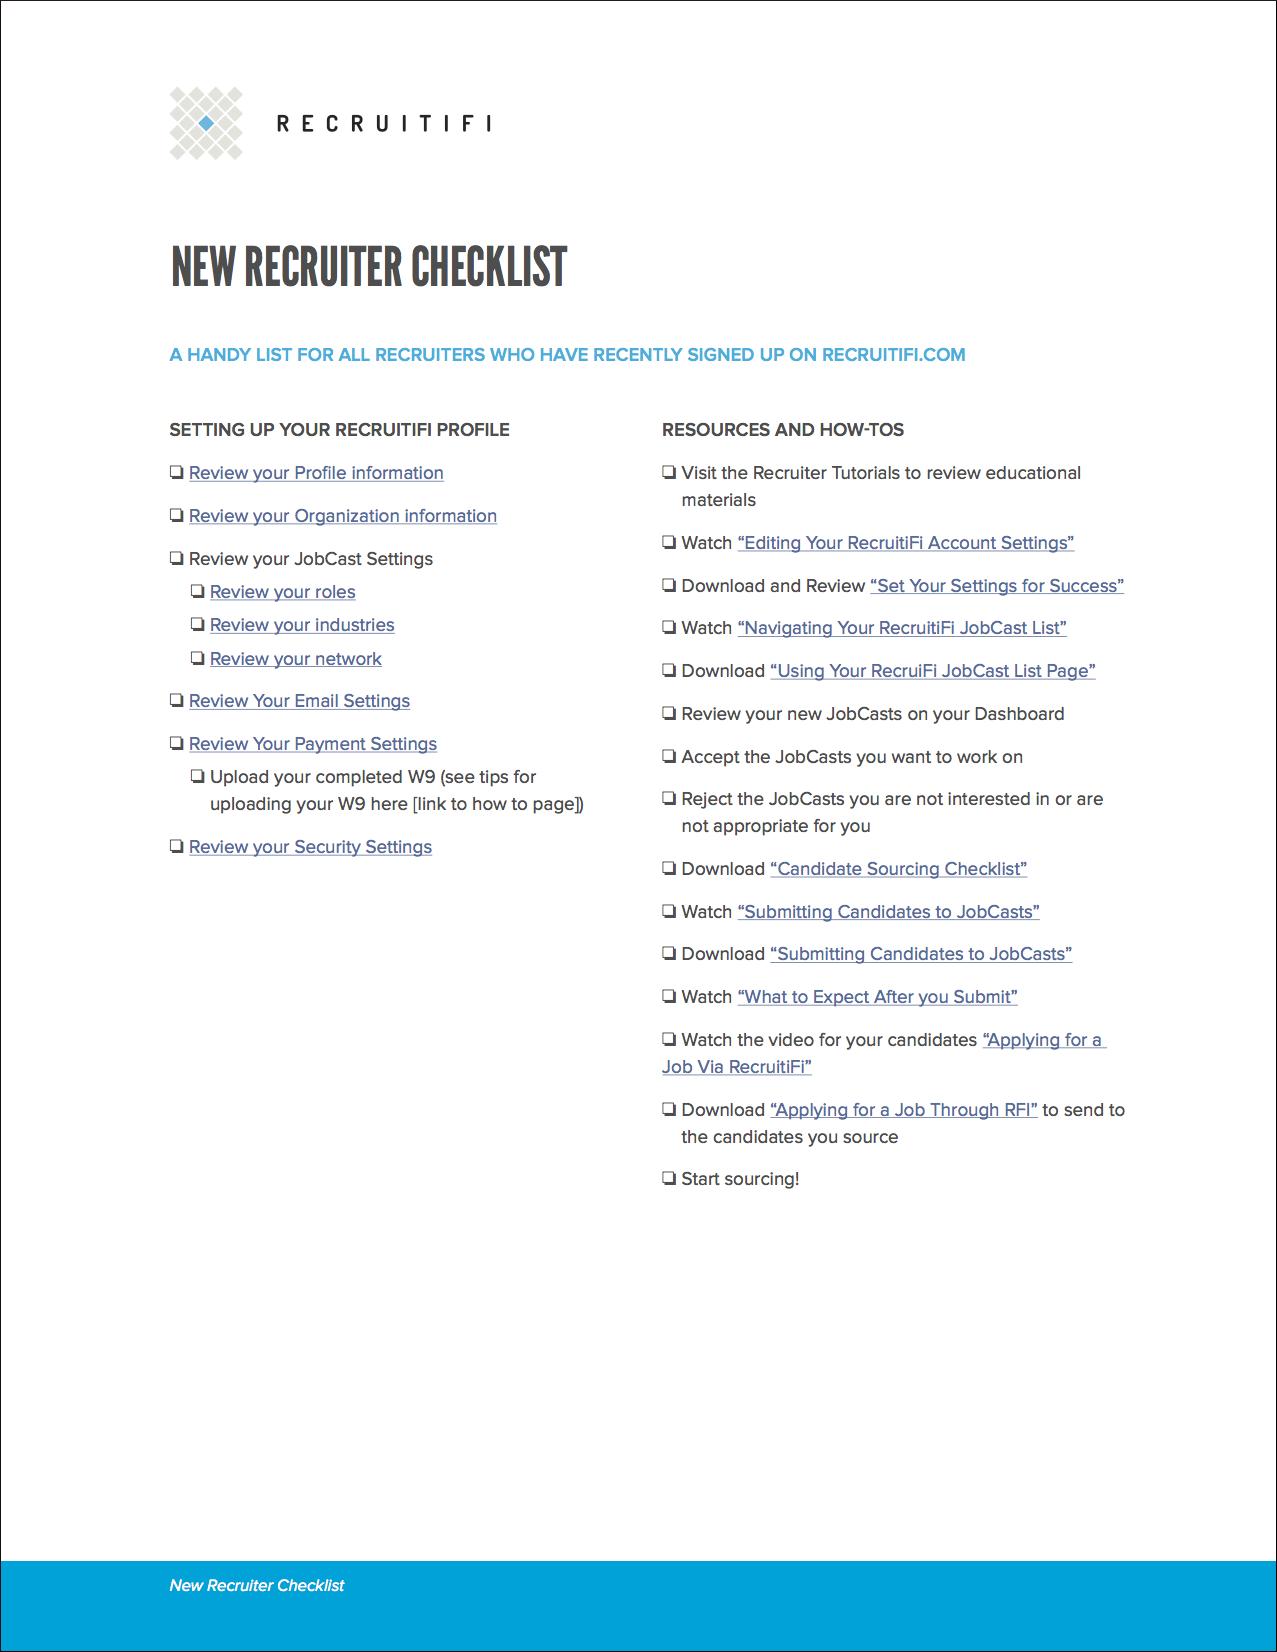 new_recruiter_checklist.png